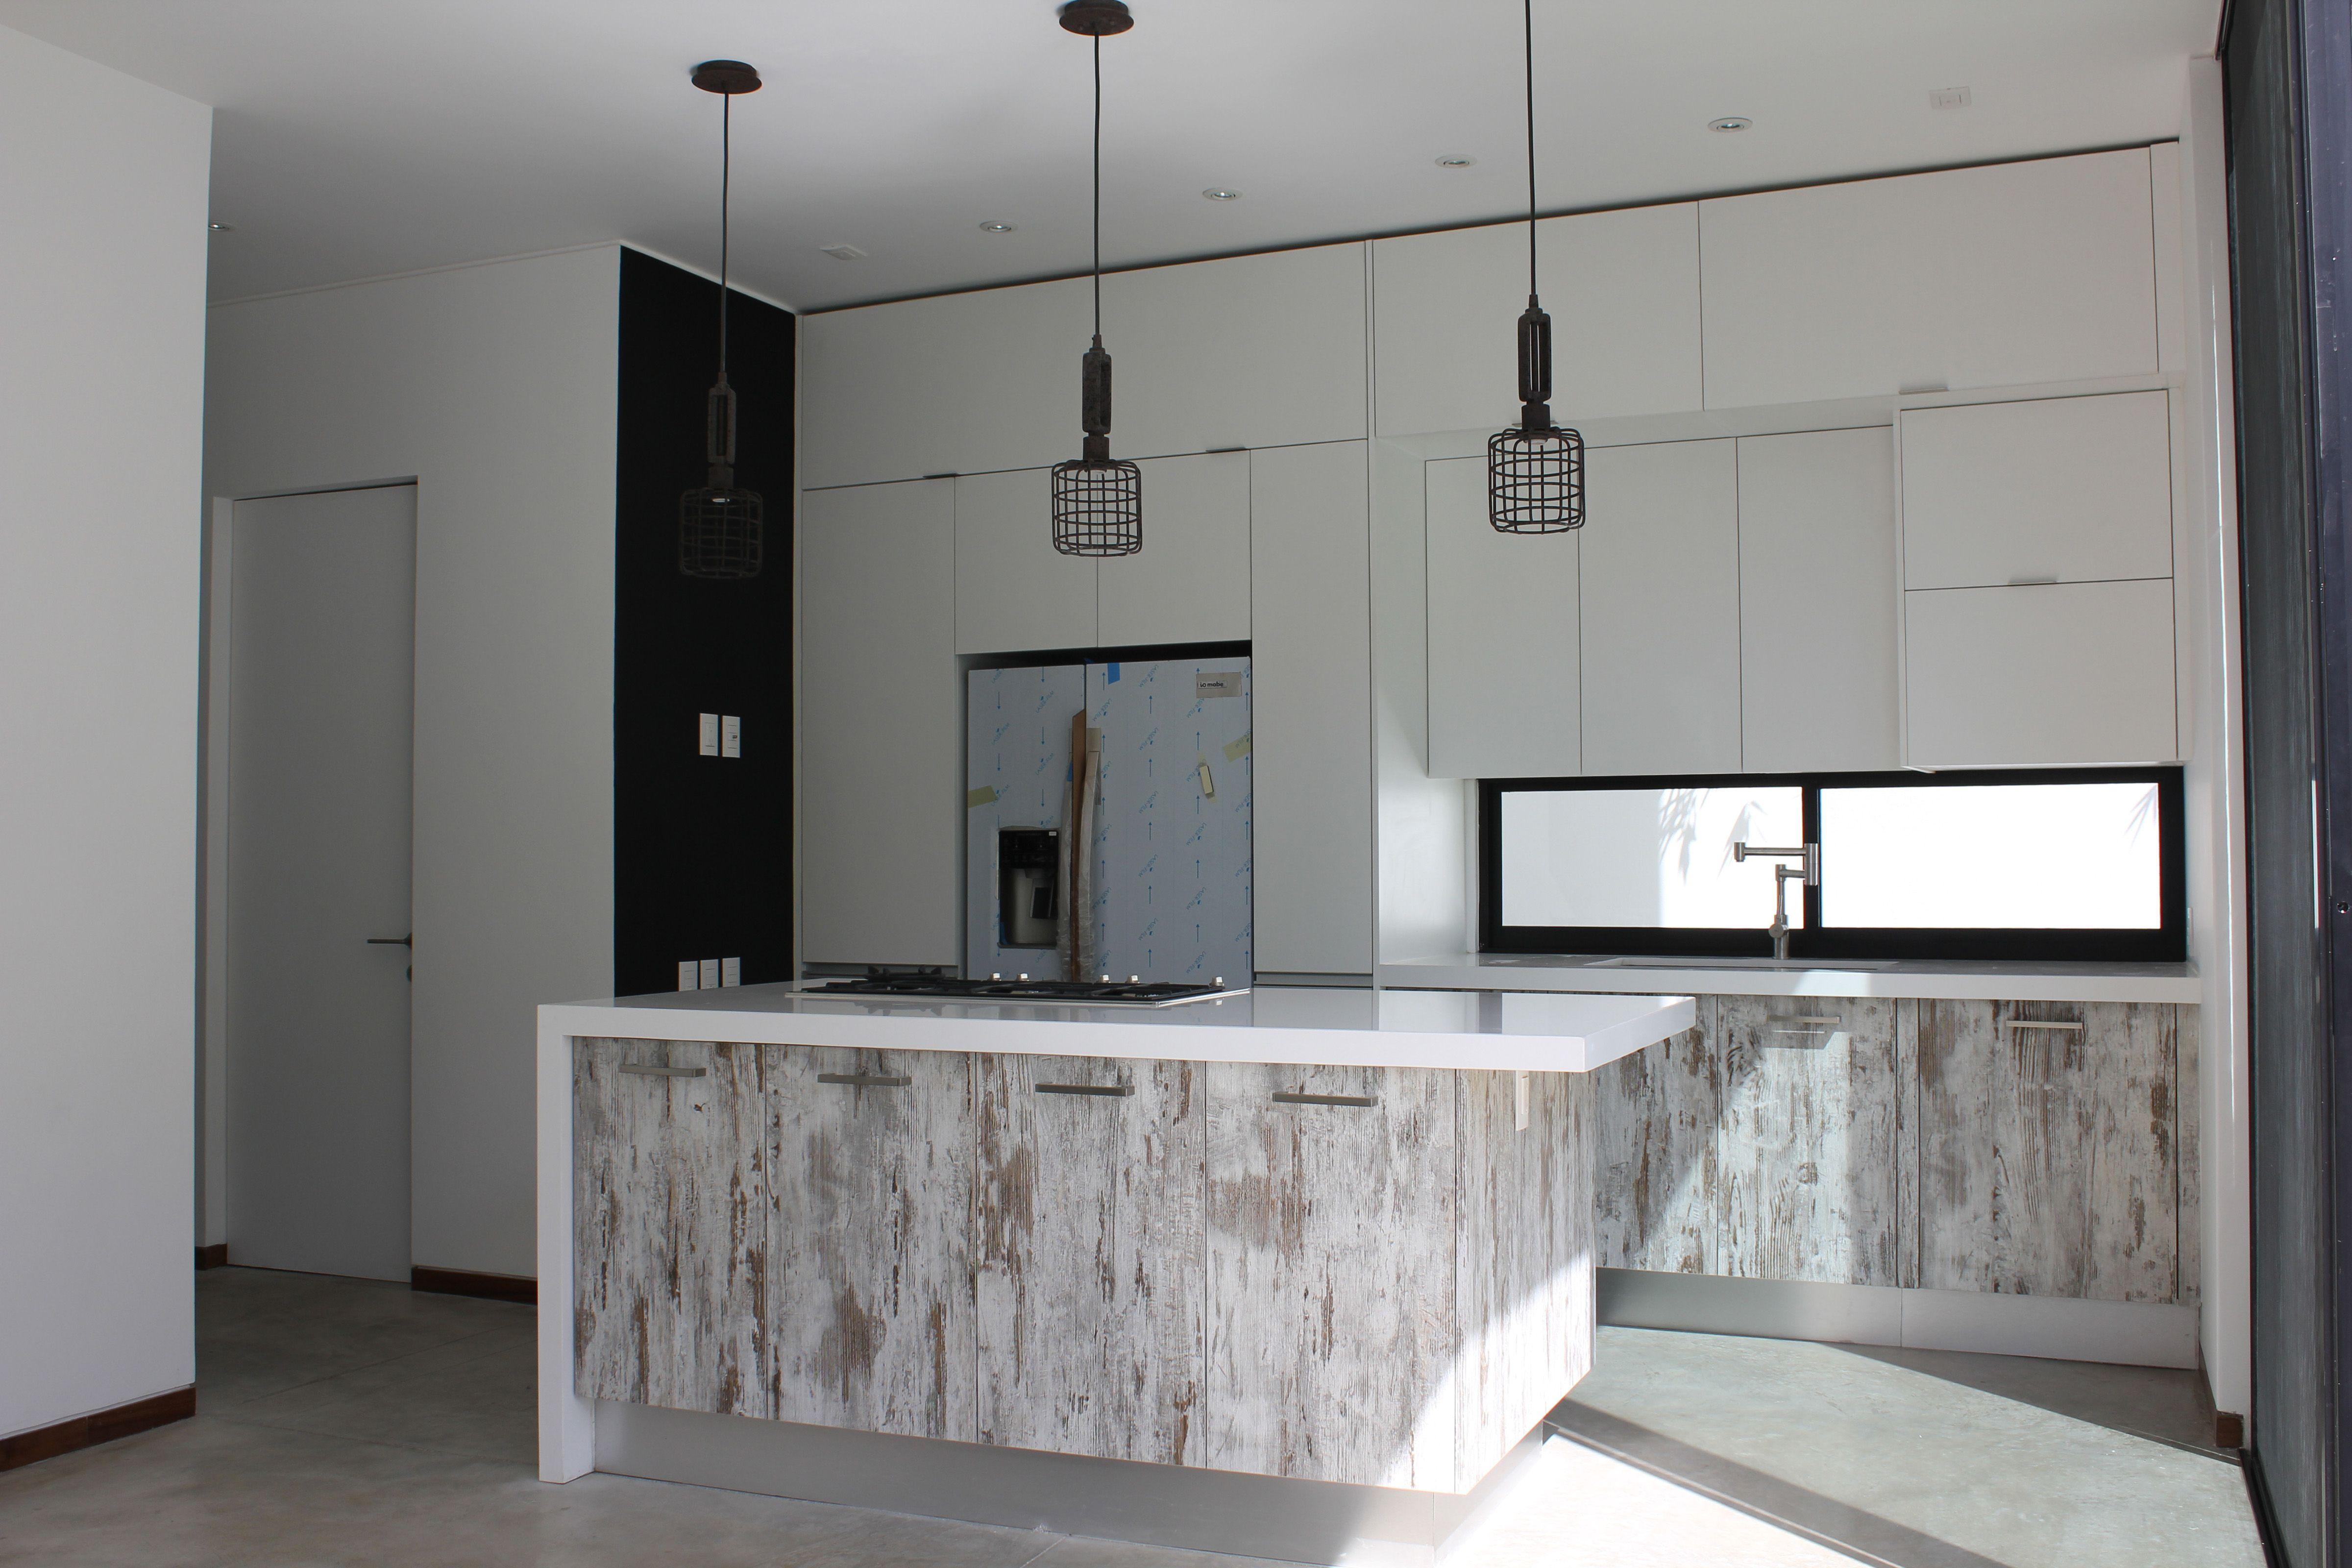 Casa en valle real cocina con madera avejentada y barra - Barra para cocina ...